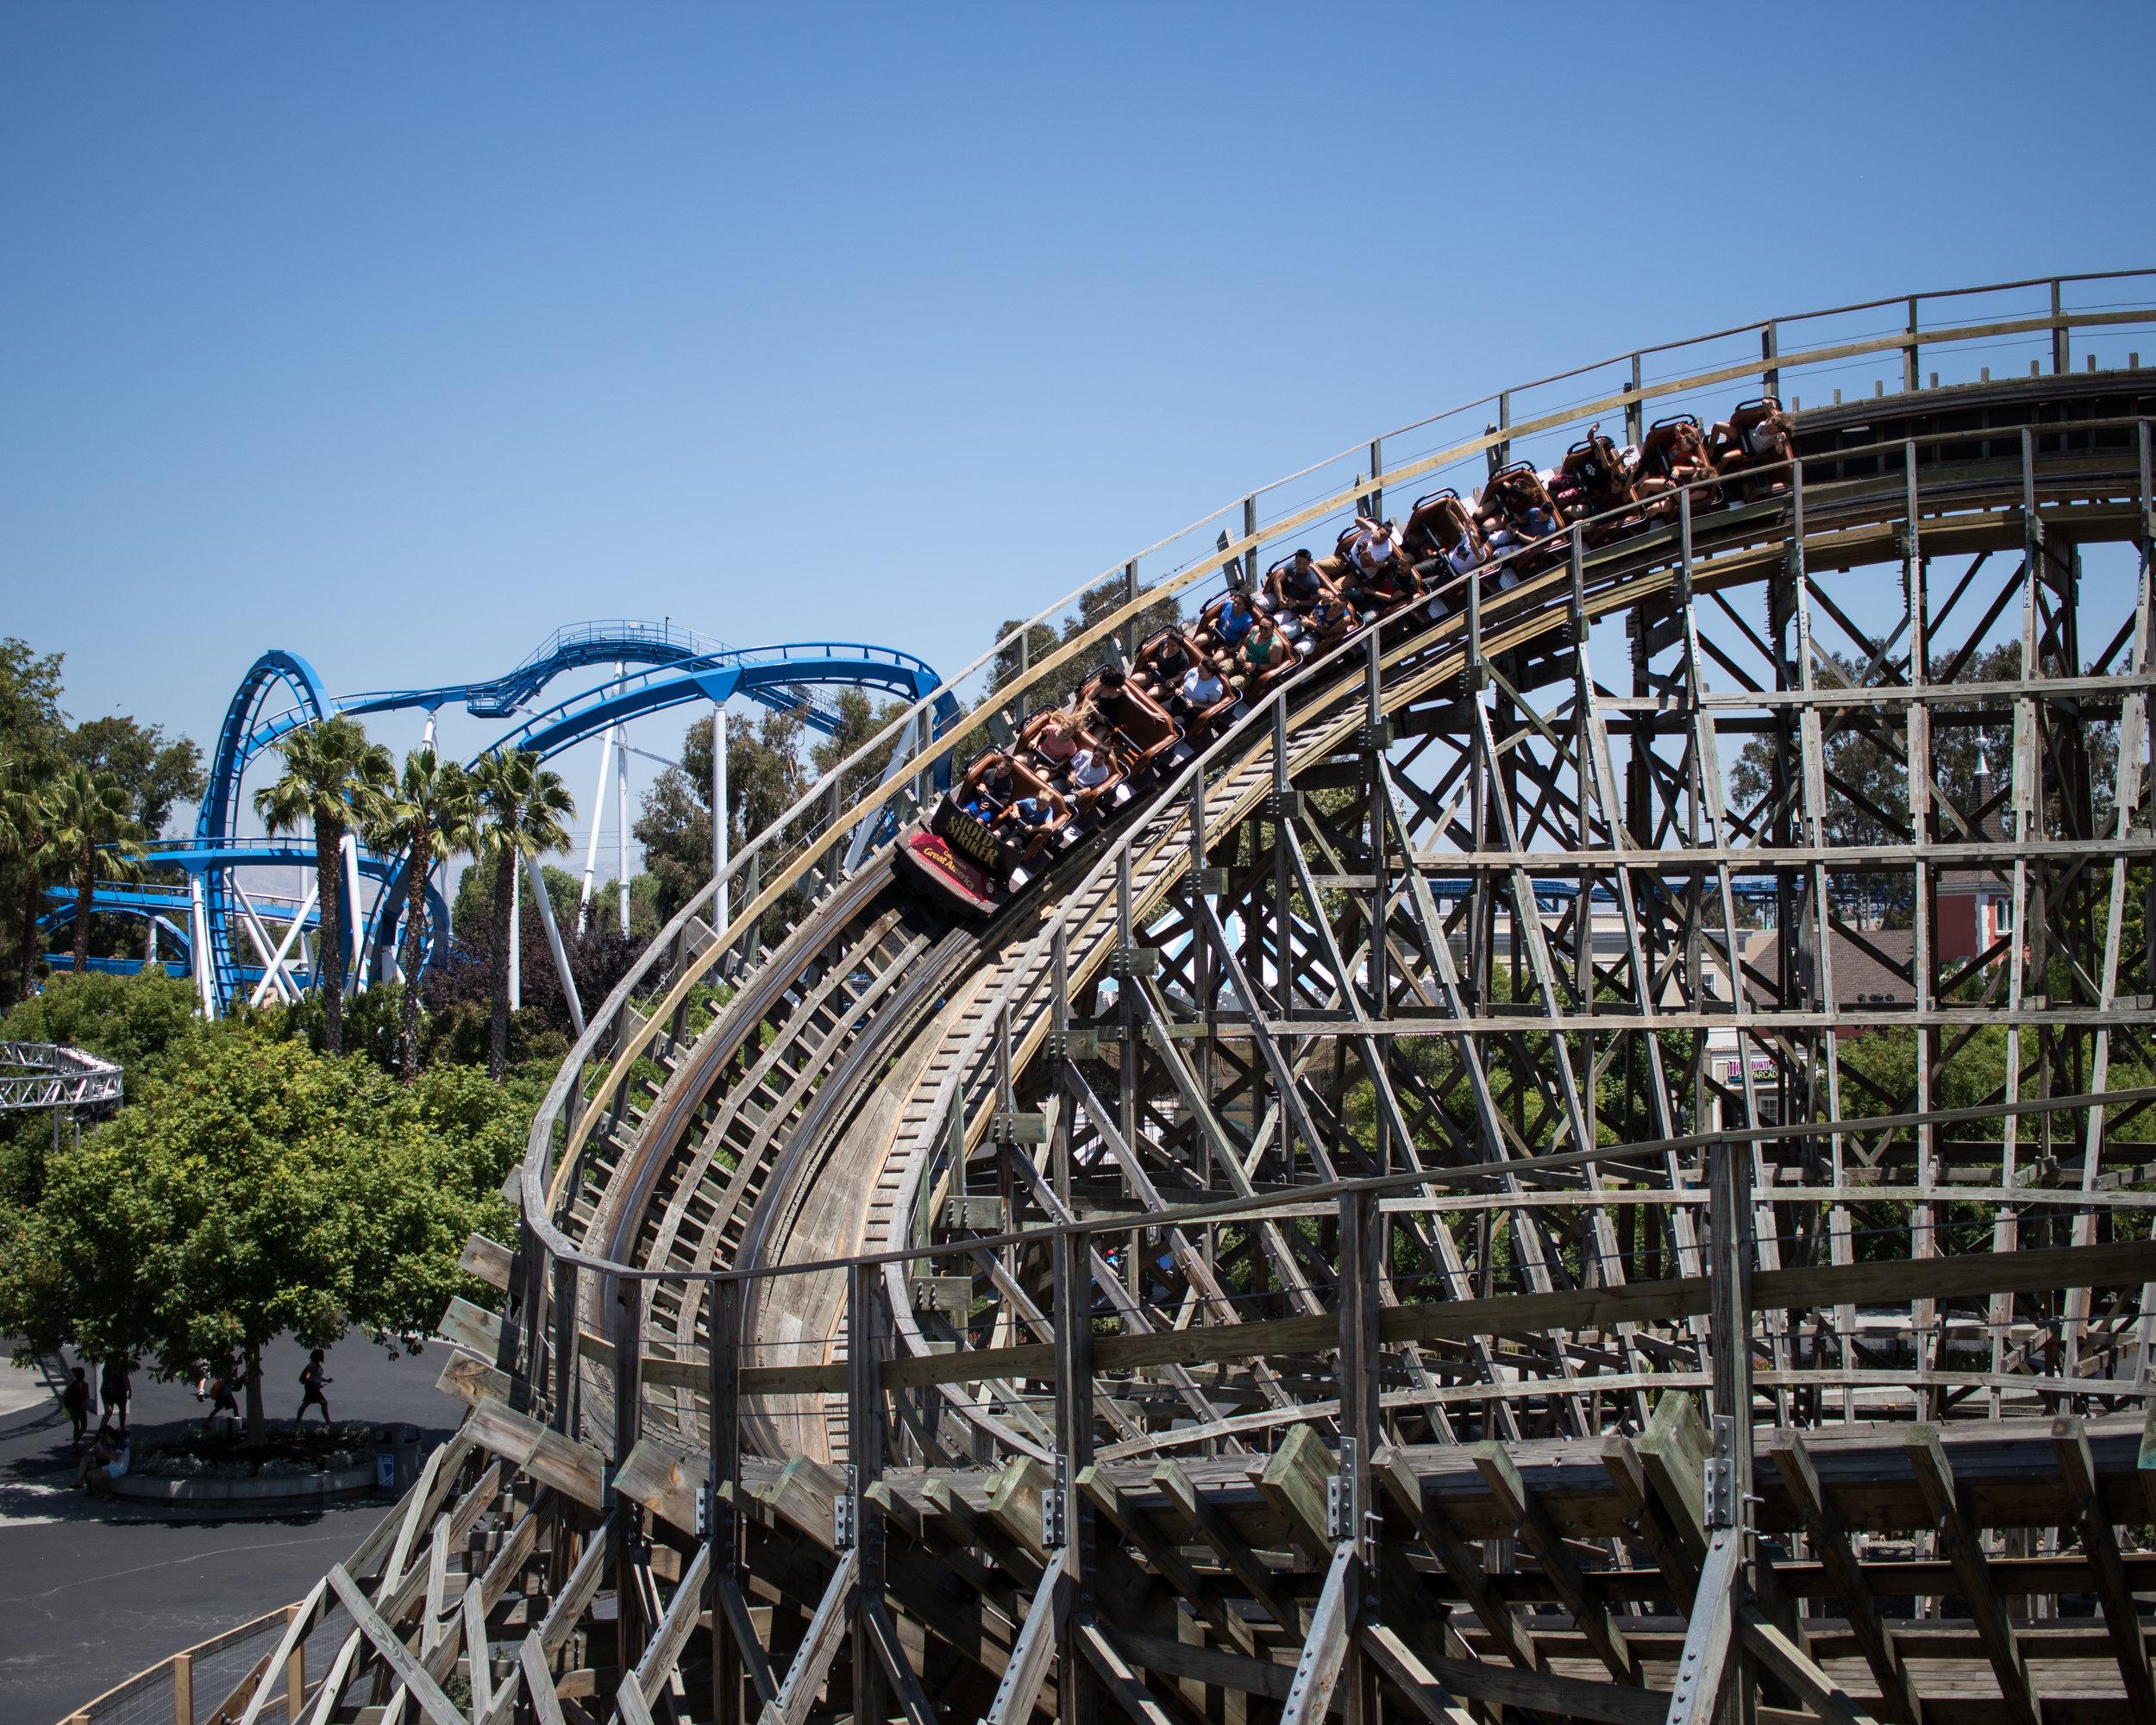 Photo: Cabin Crew Coaster Kings